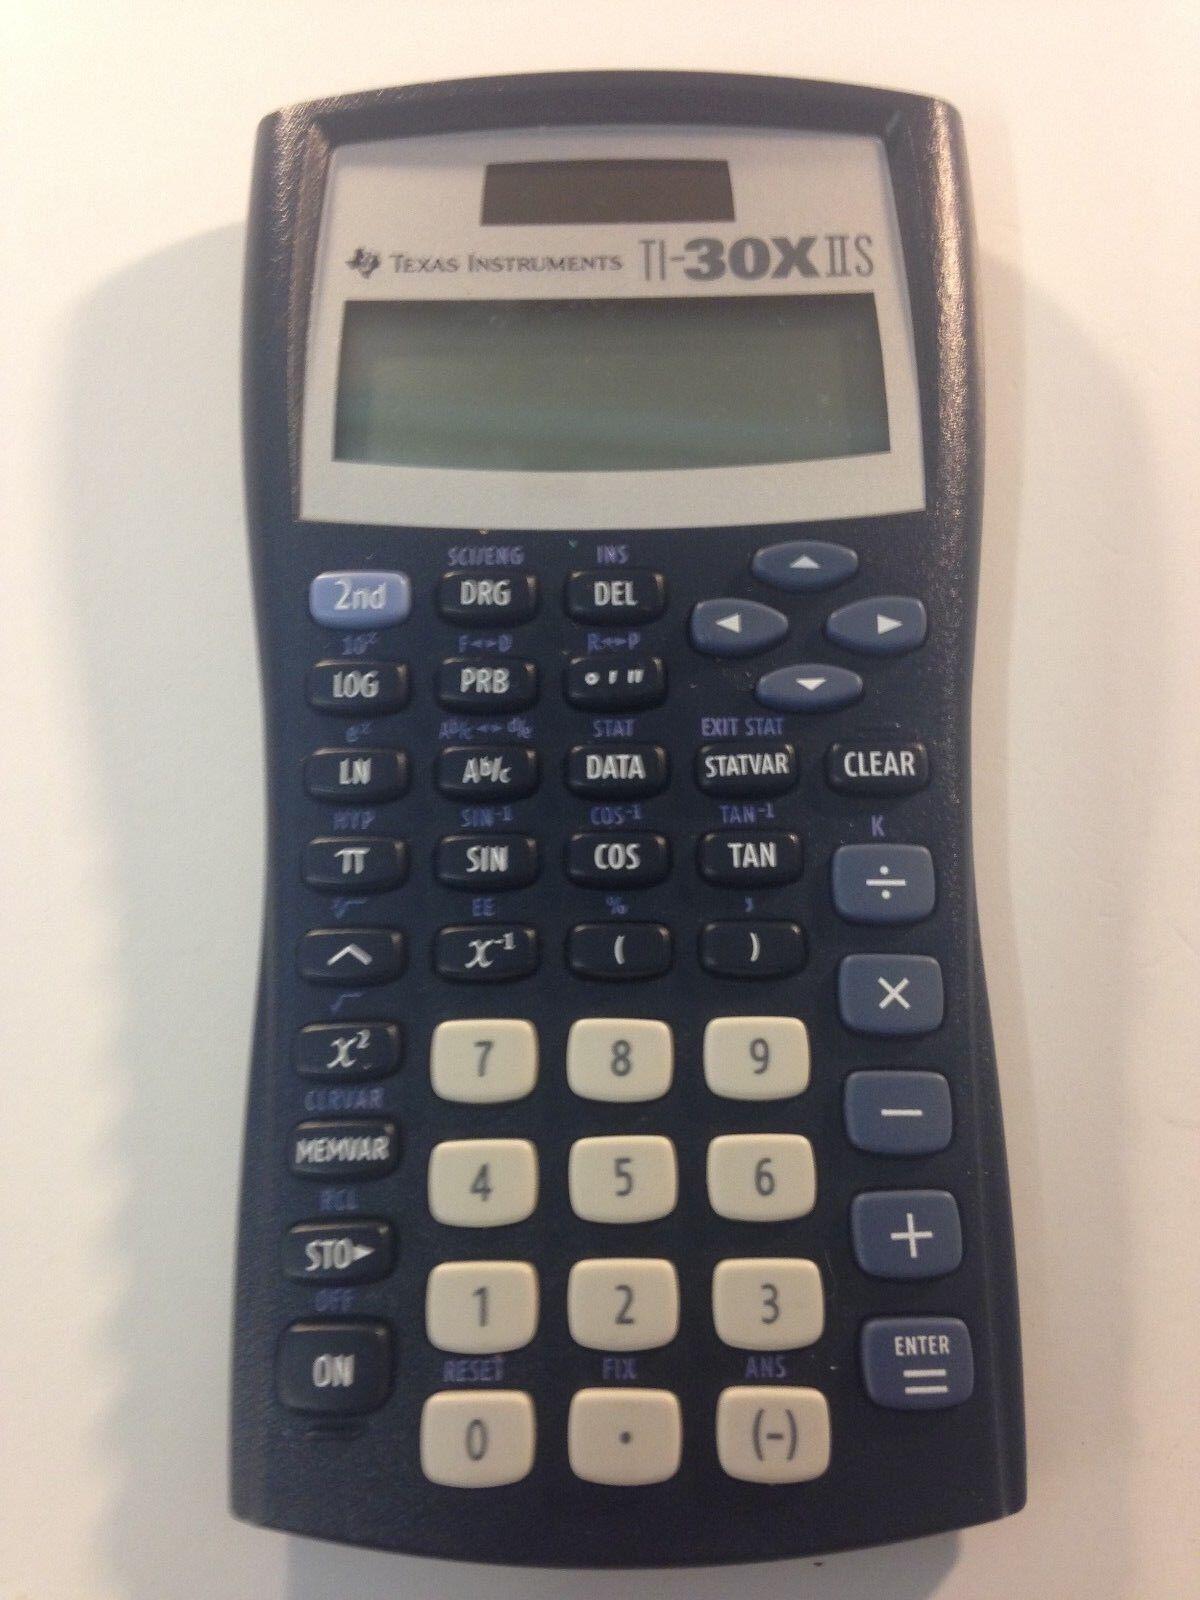 Texas Instruments TI-30X IIS Scientific Calculator, 2 Line Display NO Cover